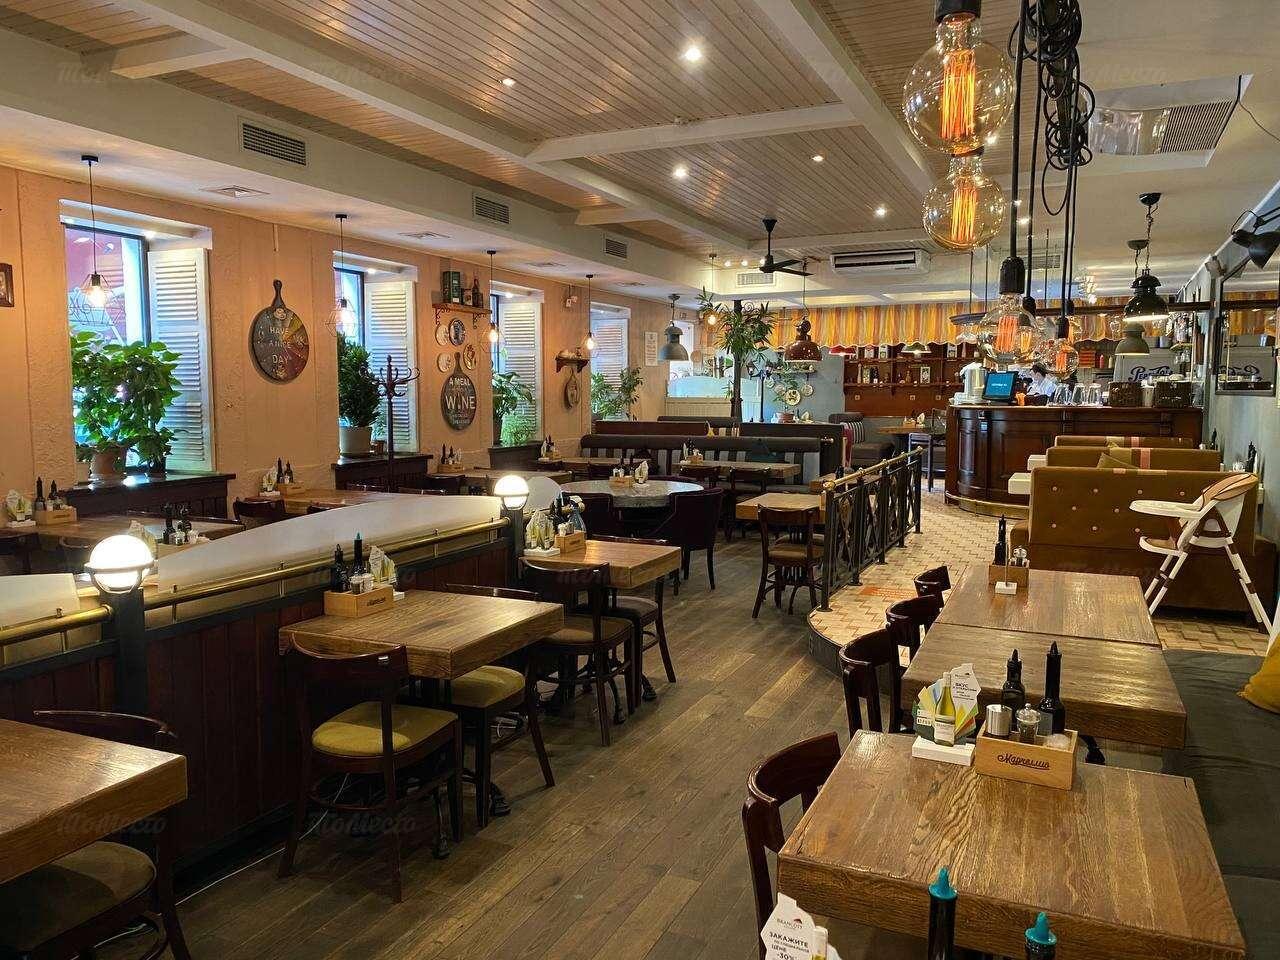 Ресторан Марчеллис (Marcellis) на улице Восстания